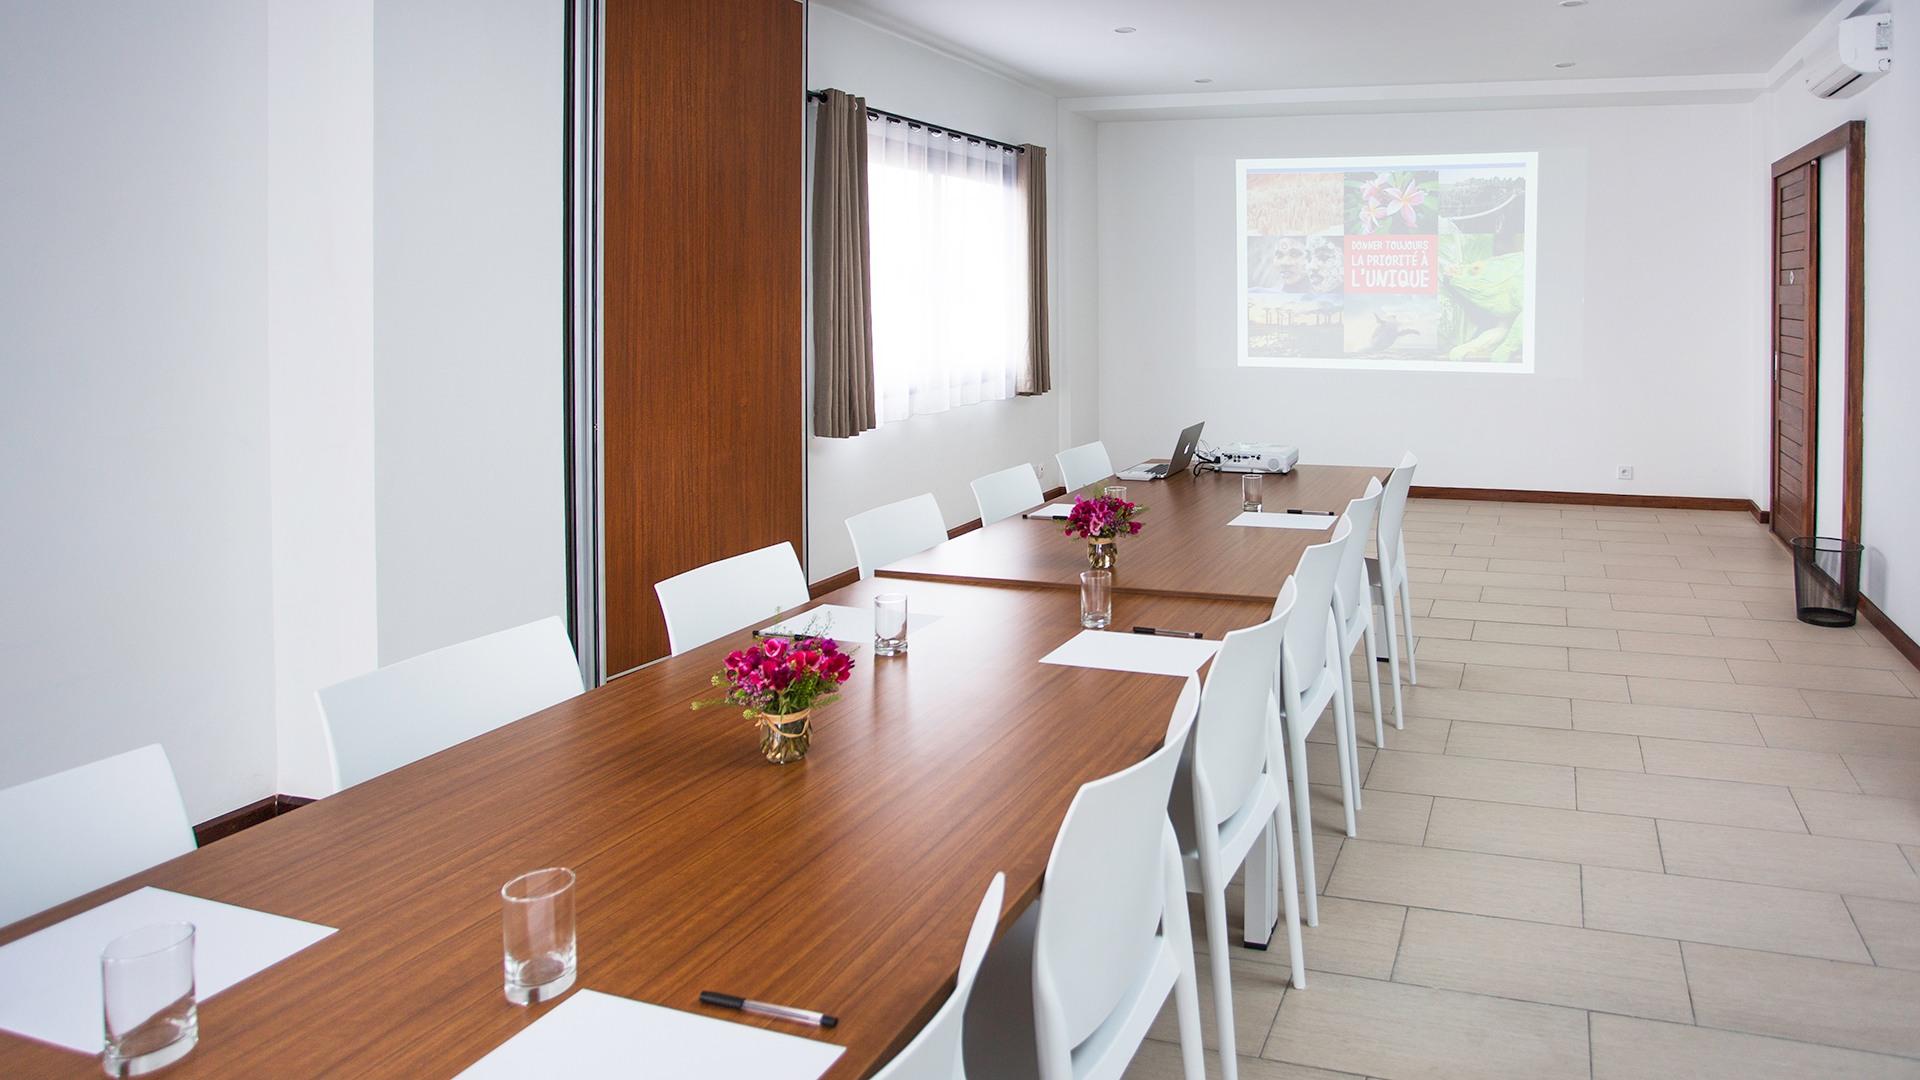 Tsanga Tsanga Hotel Meeting Room